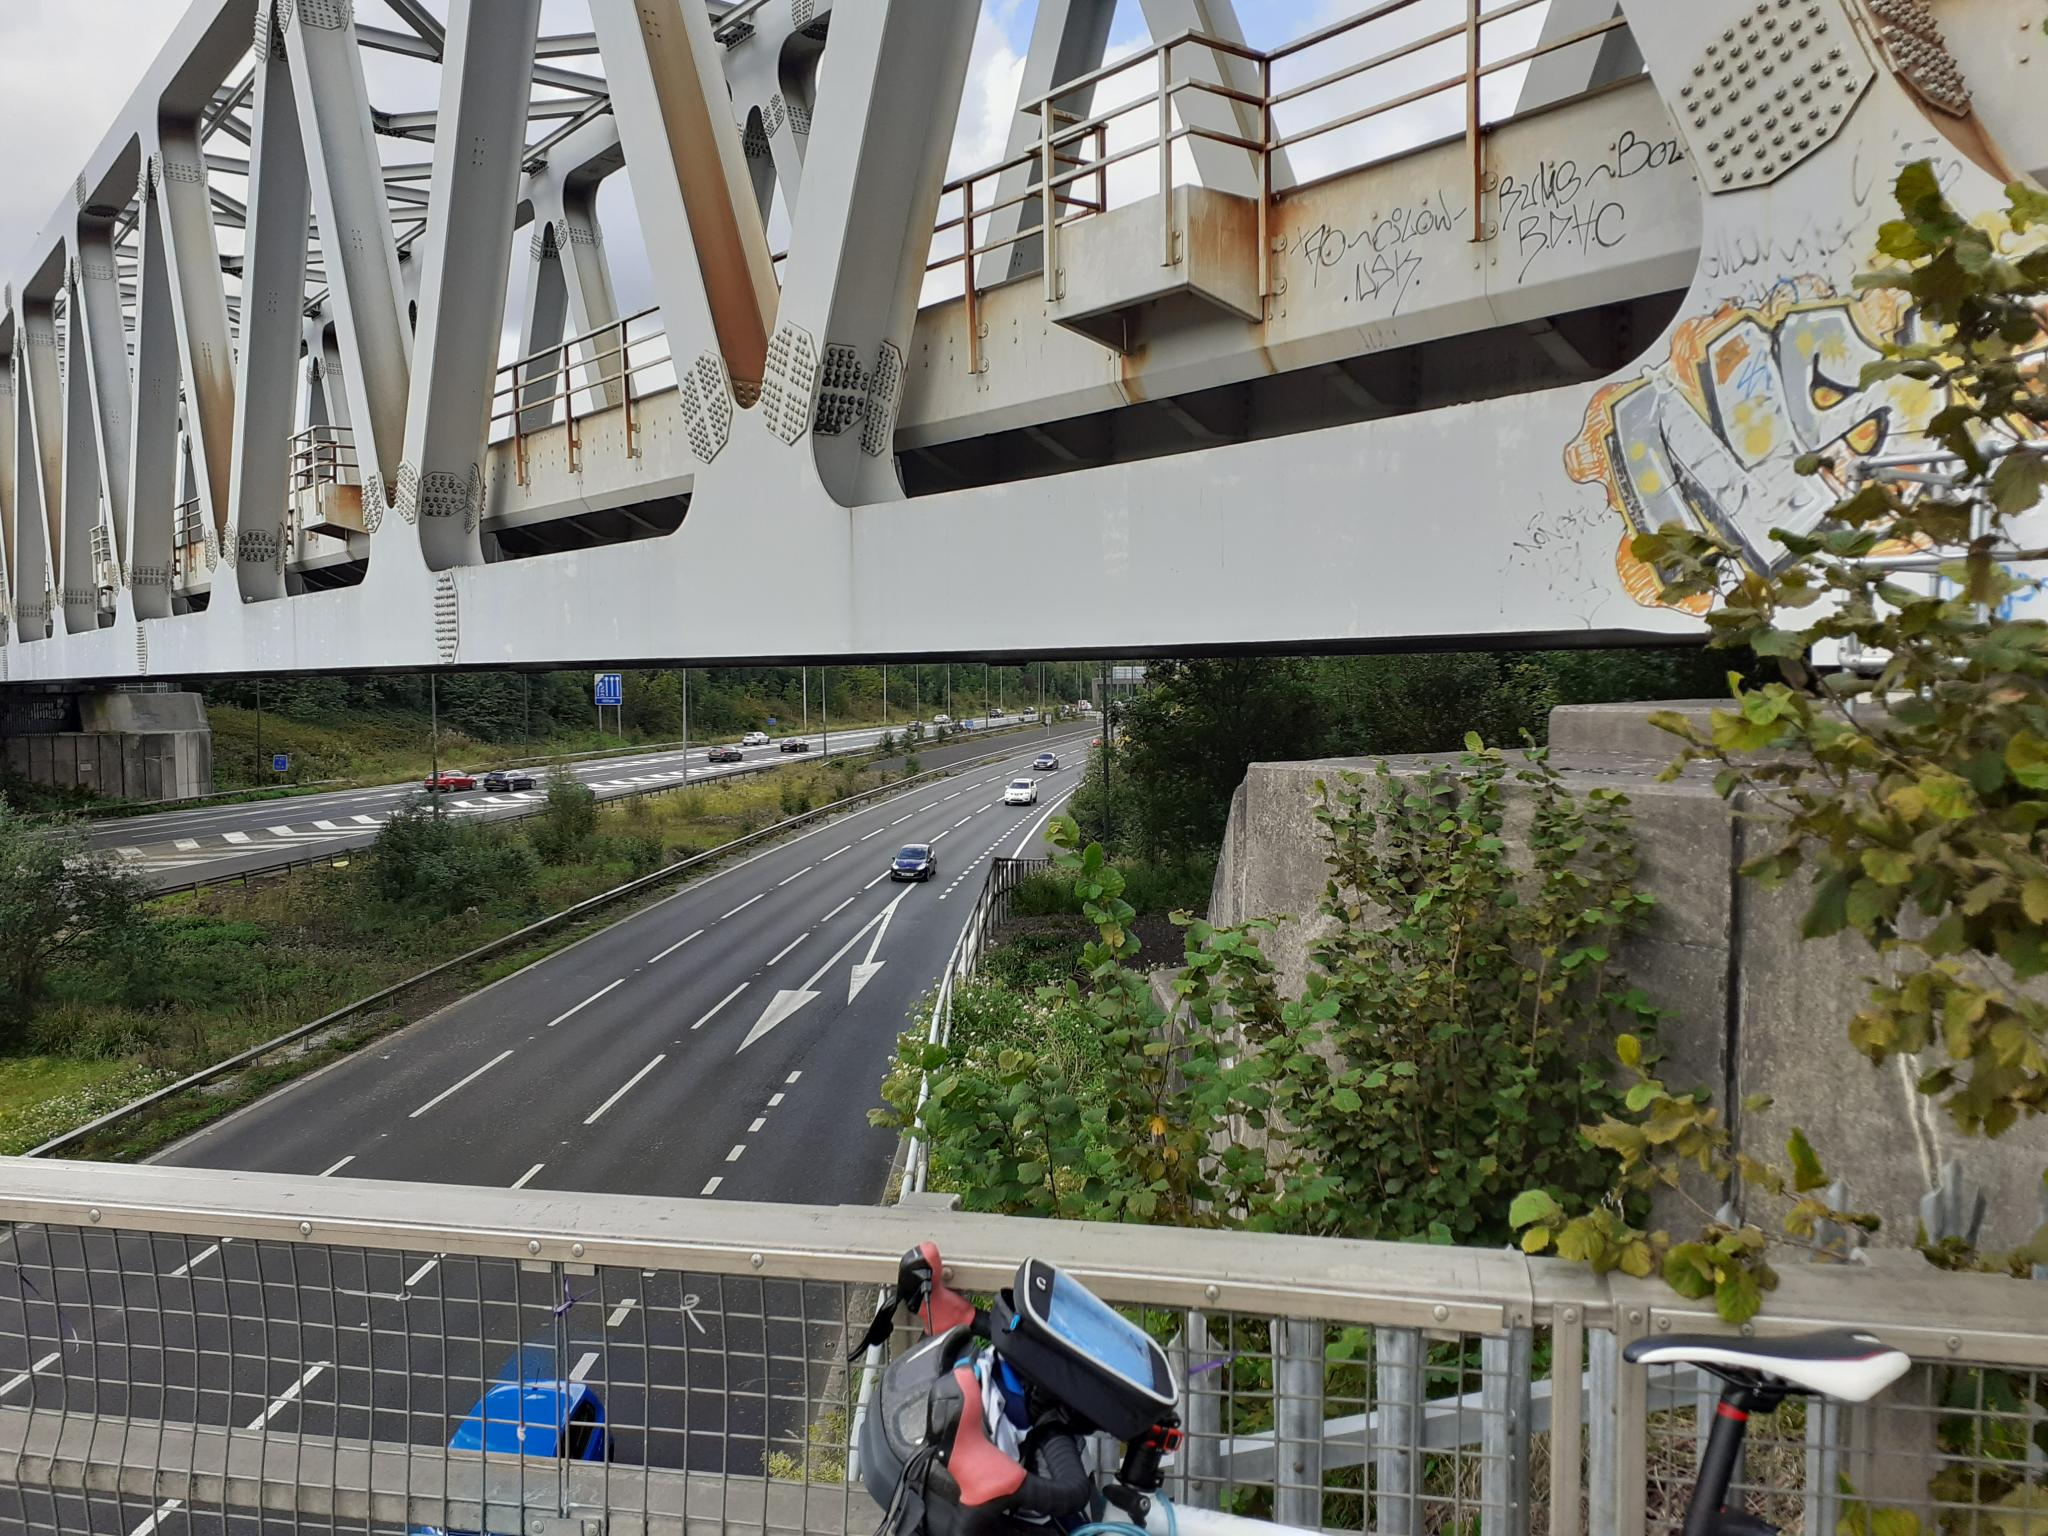 On my bike-20200905_154807-jpg